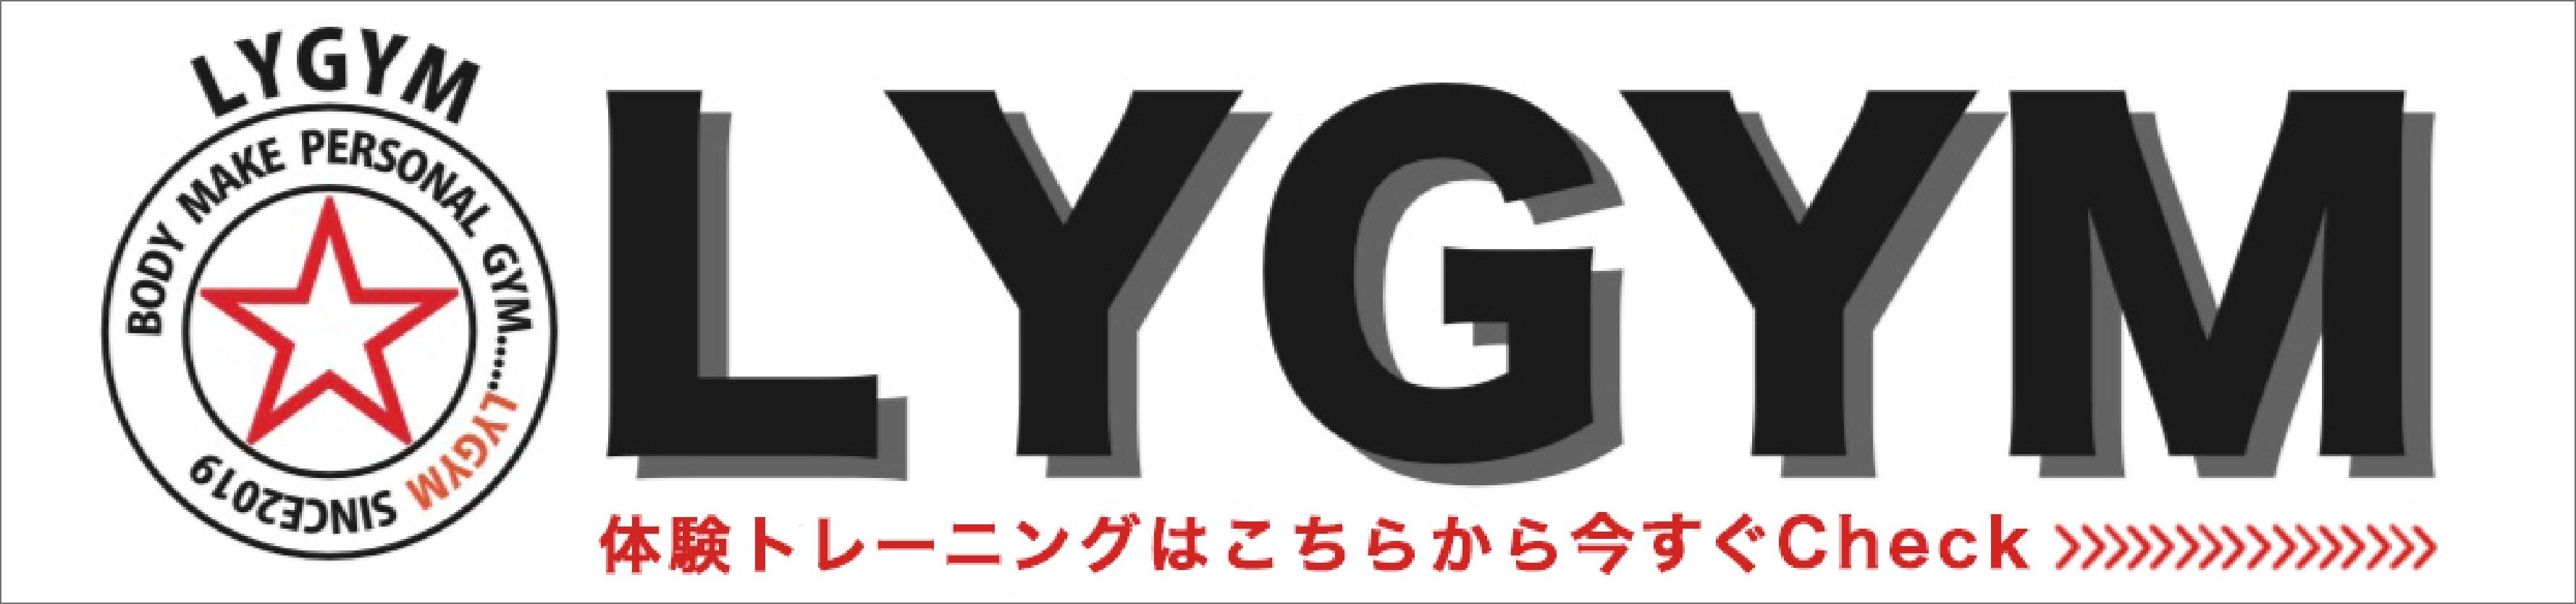 LYGYM体験トレーニングはこちらから今すぐチェエク